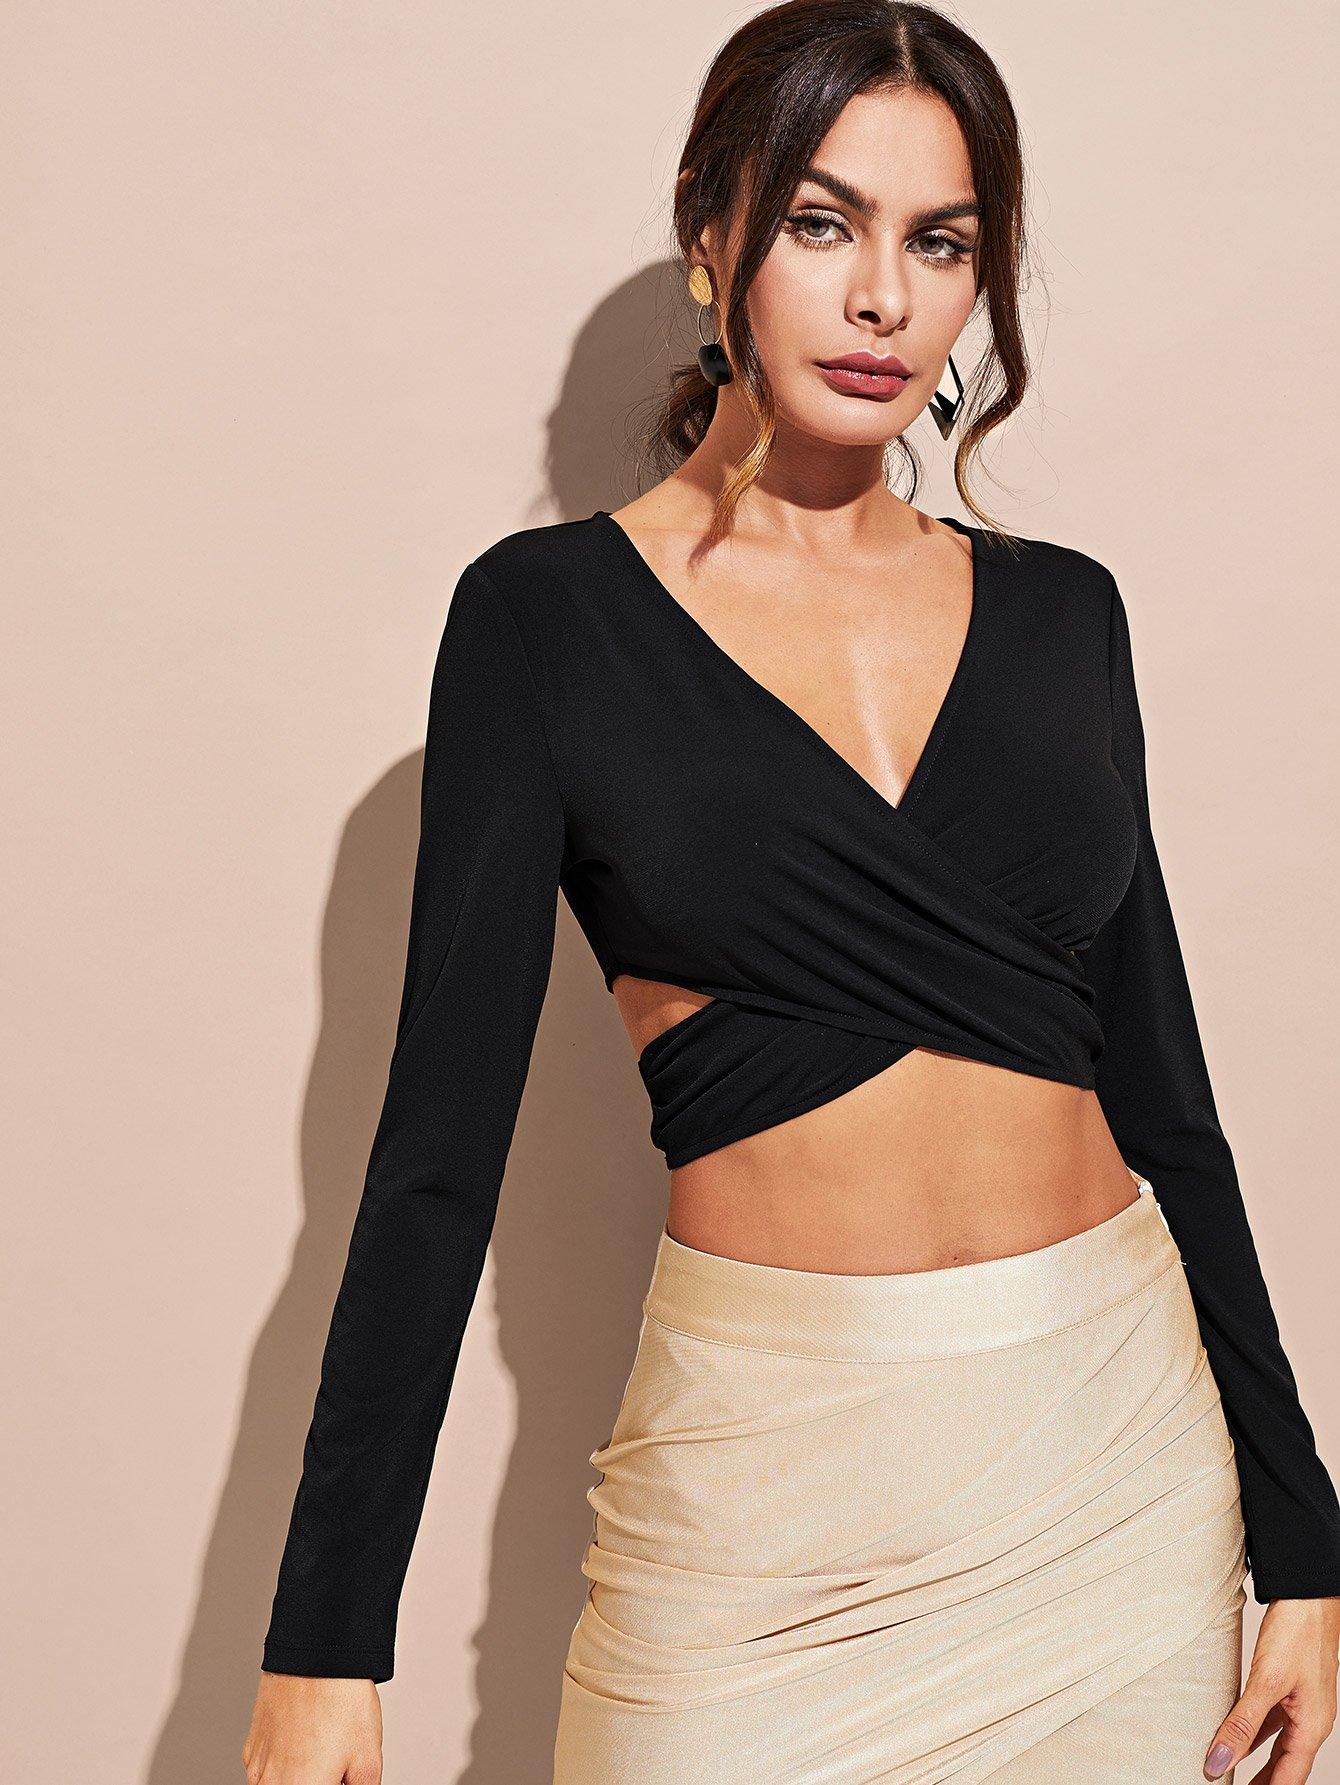 e0b6dd12490 niceline Fashion Online Shop-De niceline(nicelineside) Online Sale